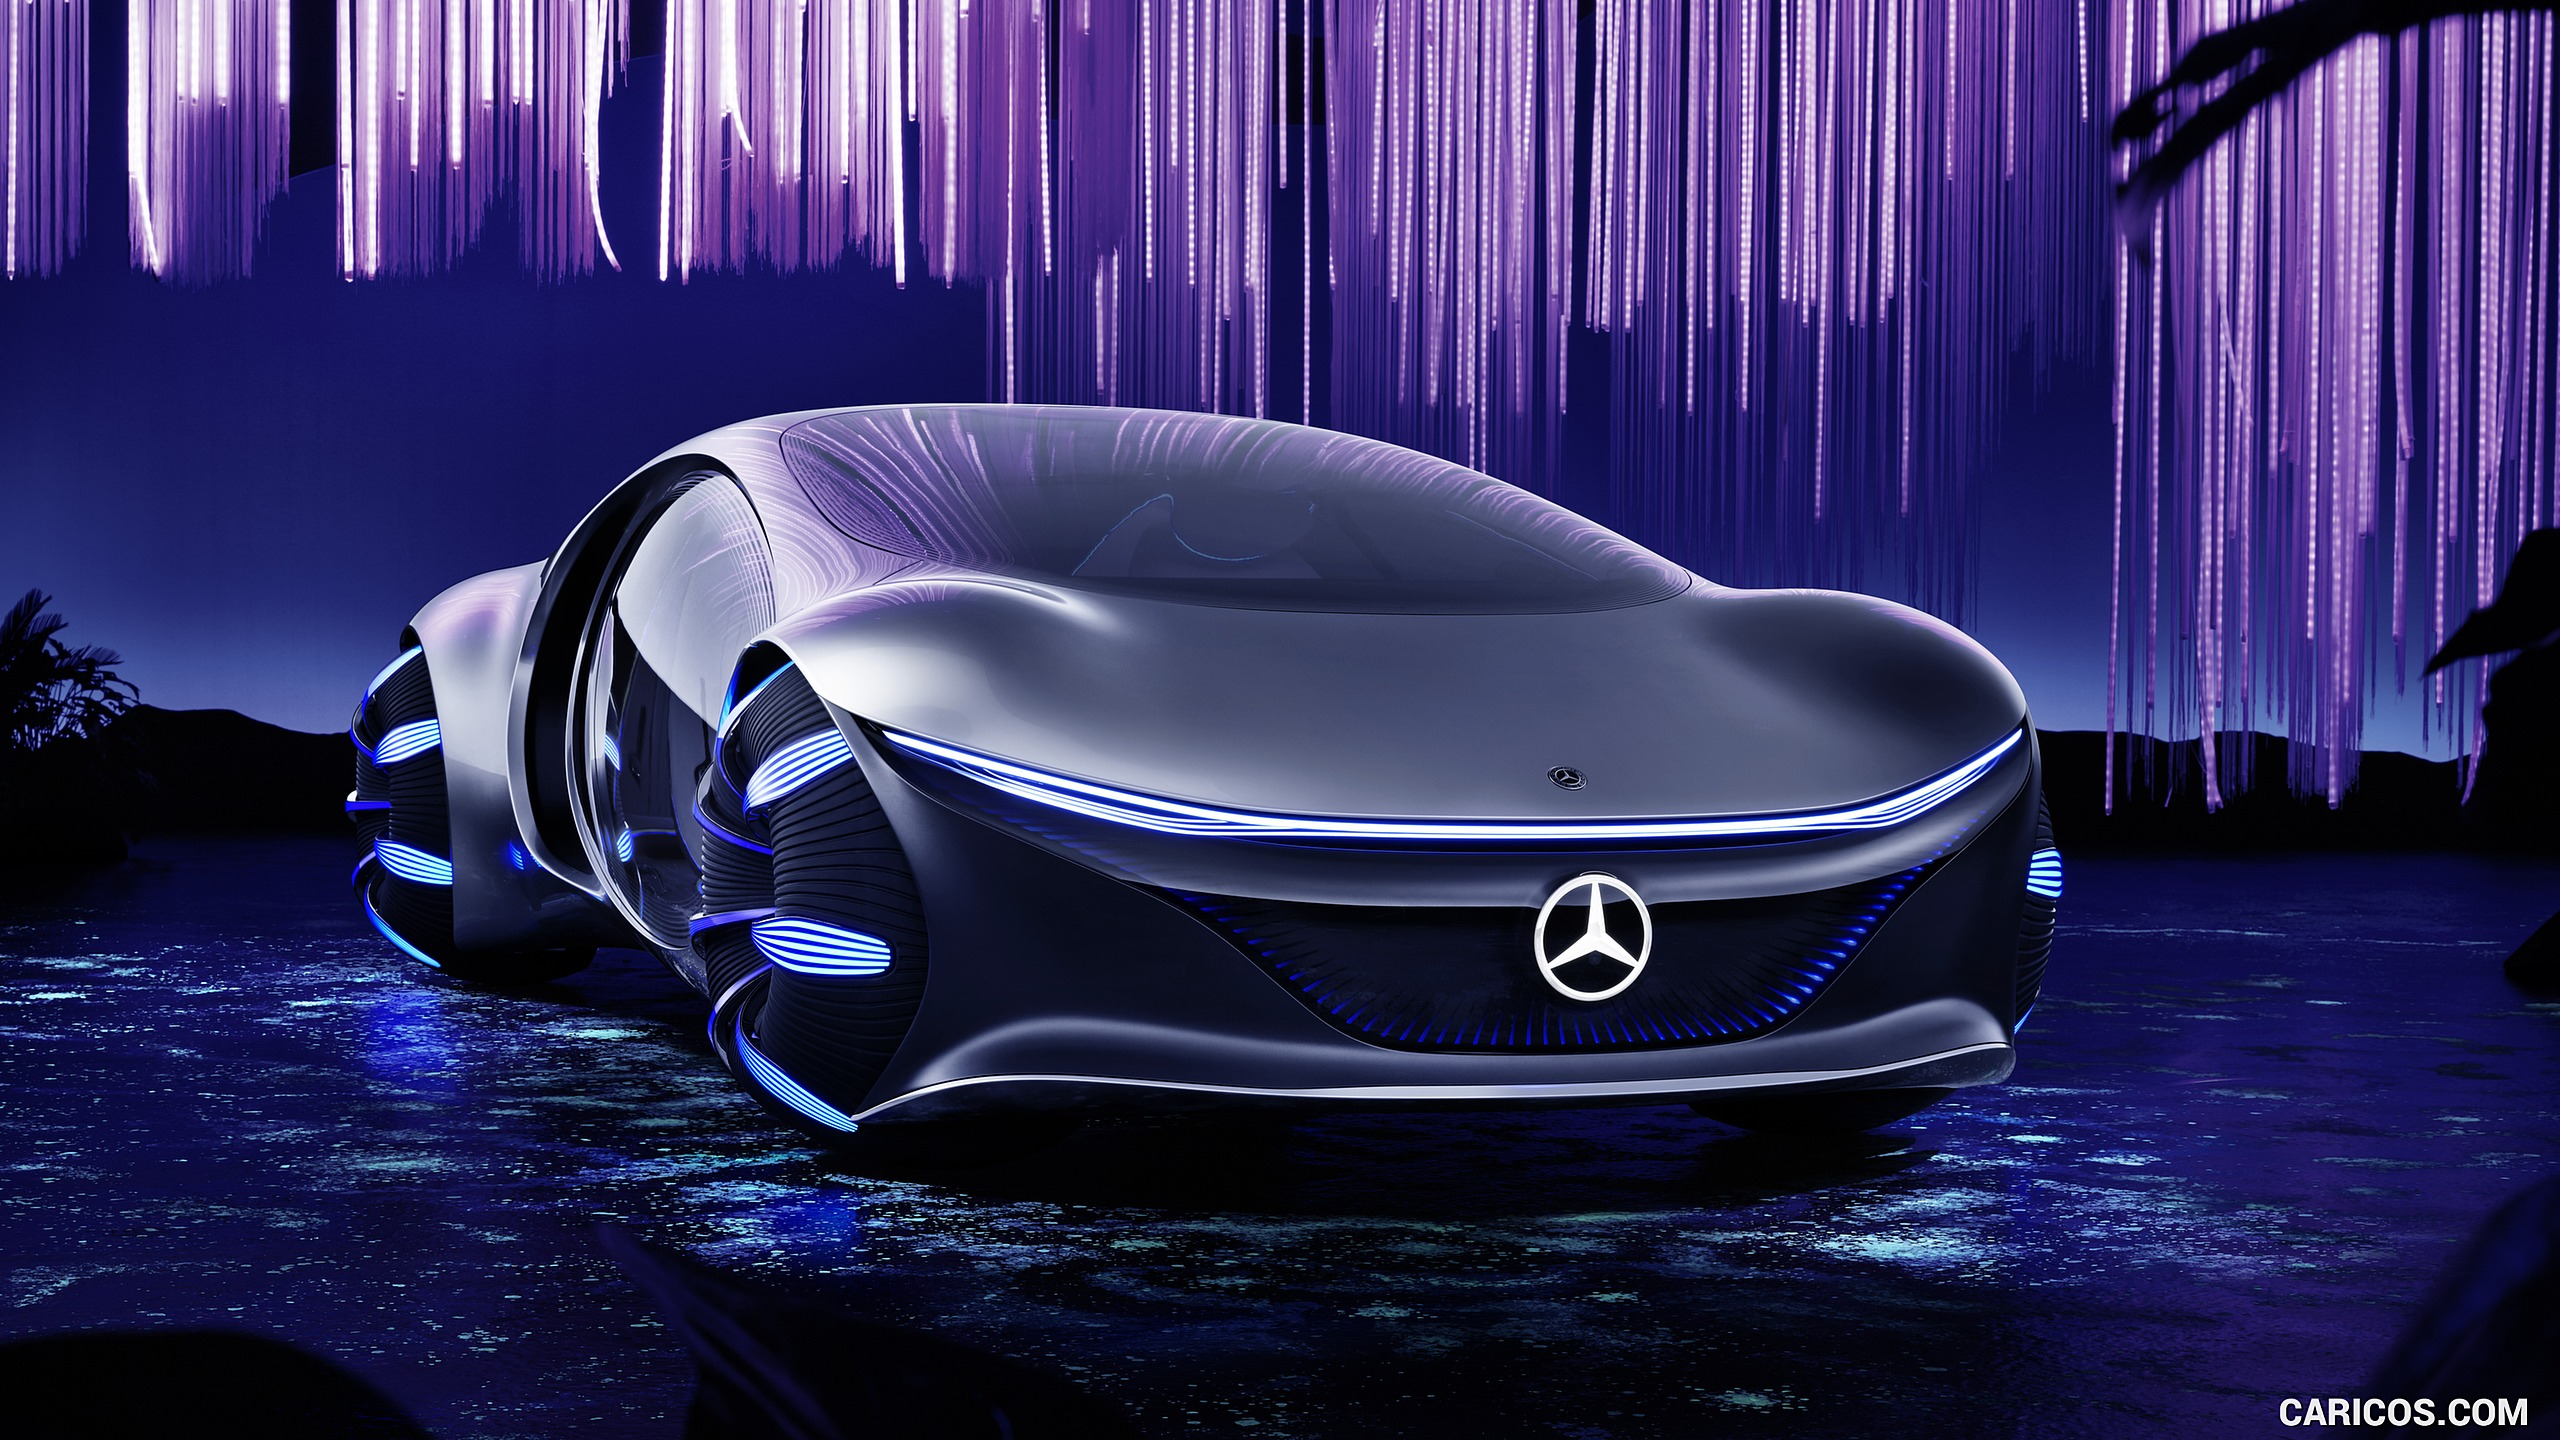 2020 Mercedes Benz VISION AVTR Concept   Front HD Wallpaper 4 2560x1440